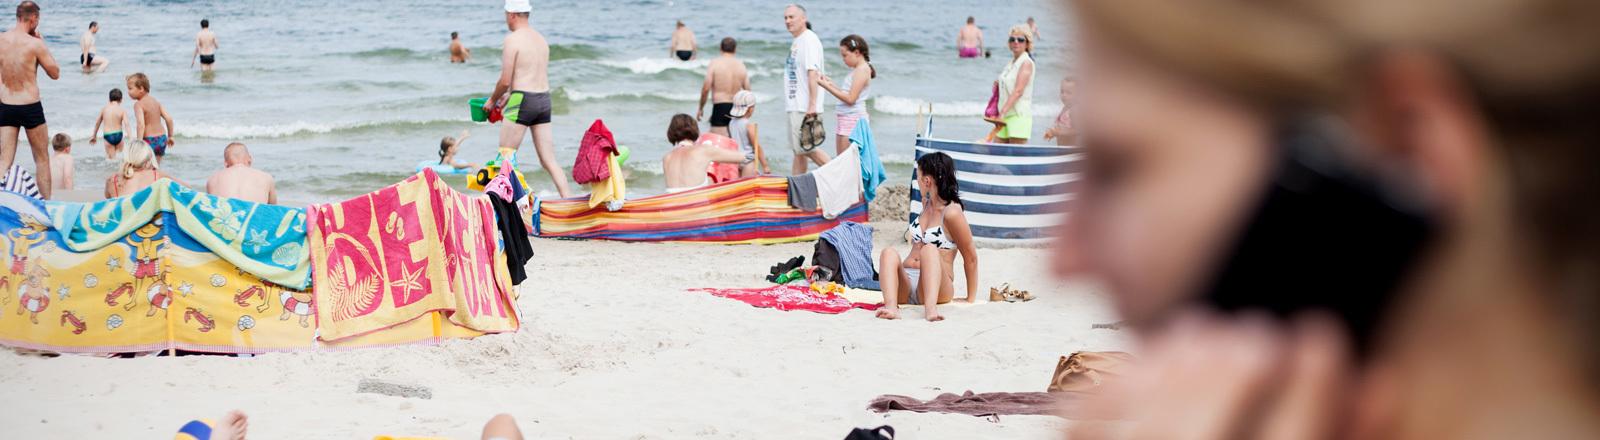 Eine Frau telefoniert im Urlaub am Strand.